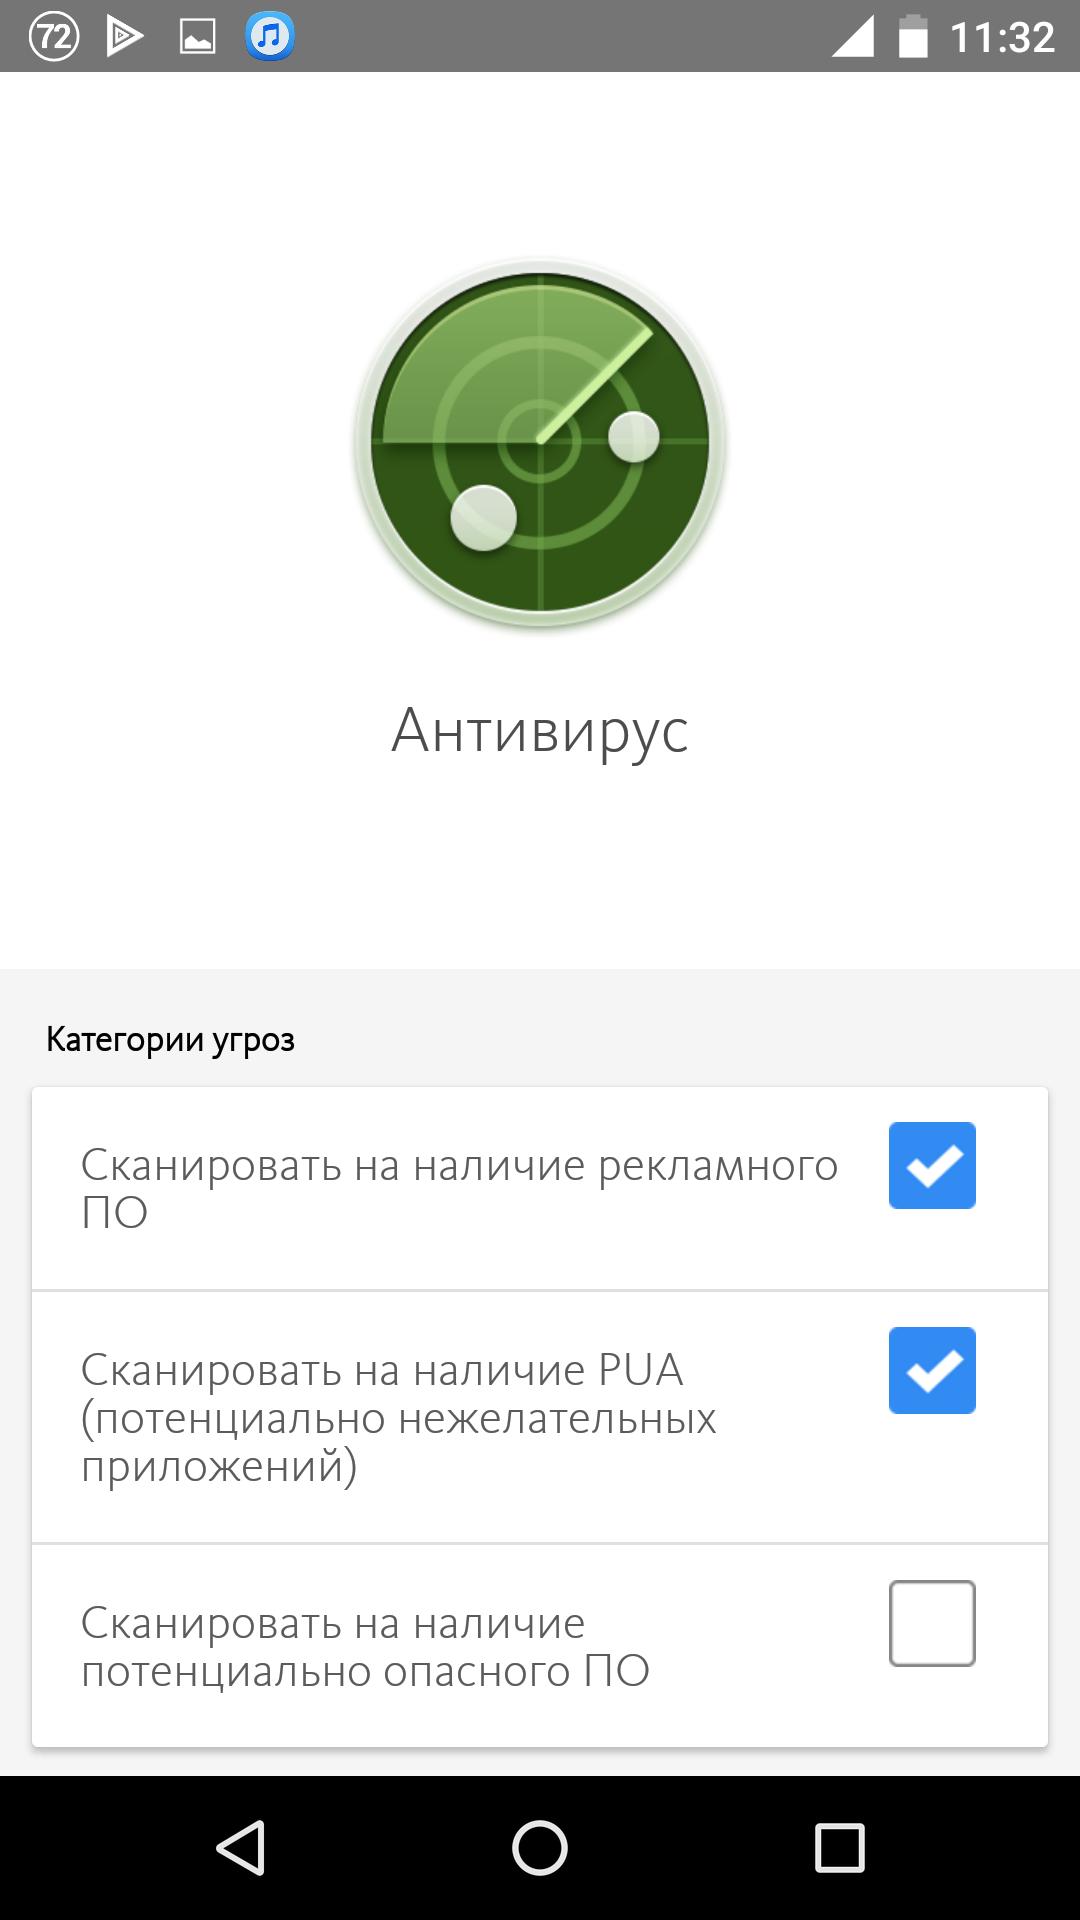 Приложения в Google Play – TunnelBear VPN